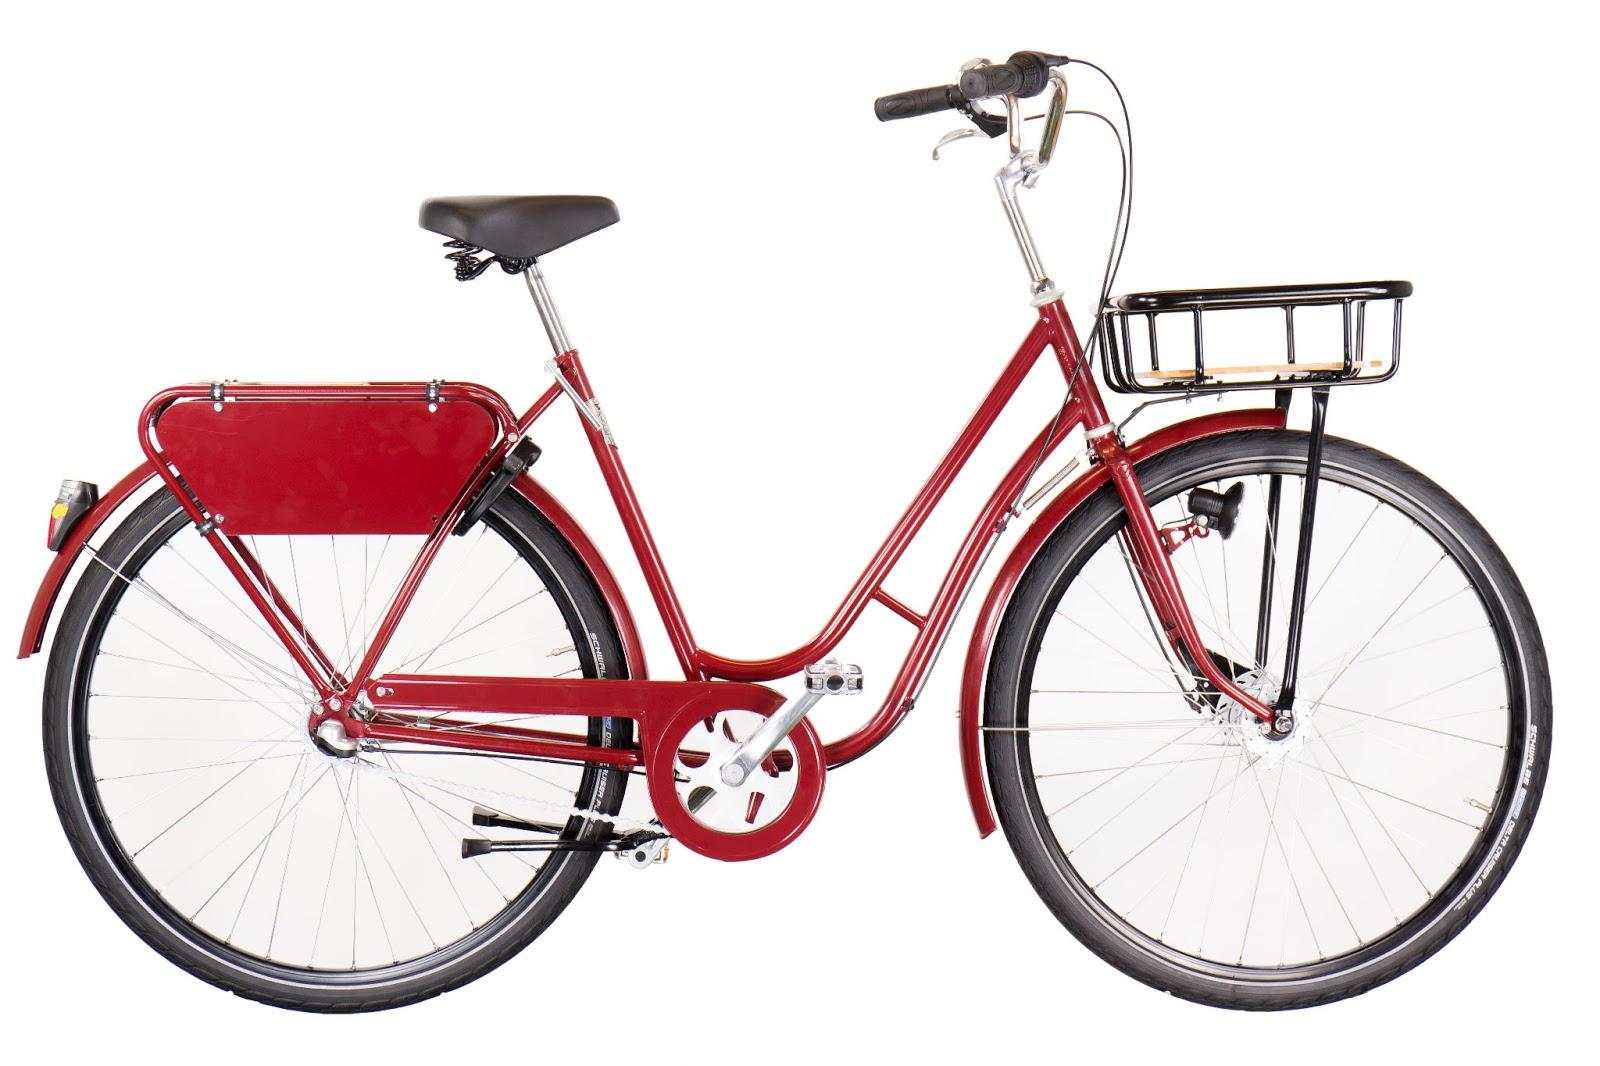 Pilen Lyx dam Röd helfärgad företagscykel.